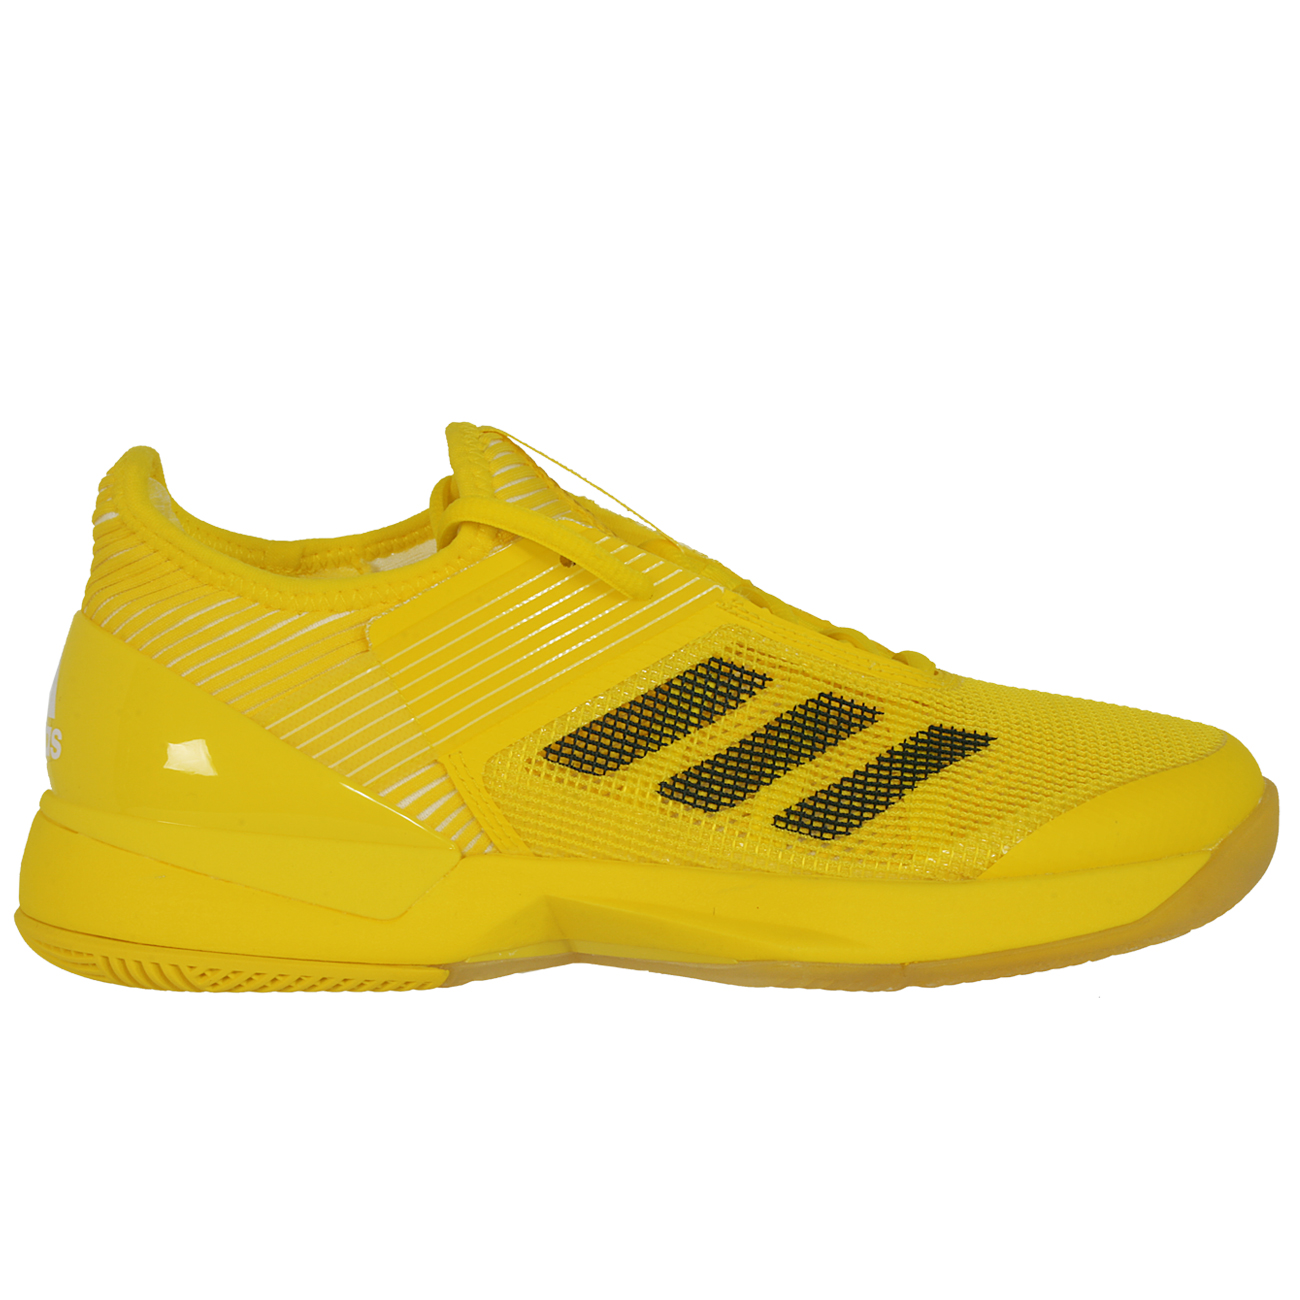 Adidas Damen Tennisschuh Adizero Ubersonic 3.0